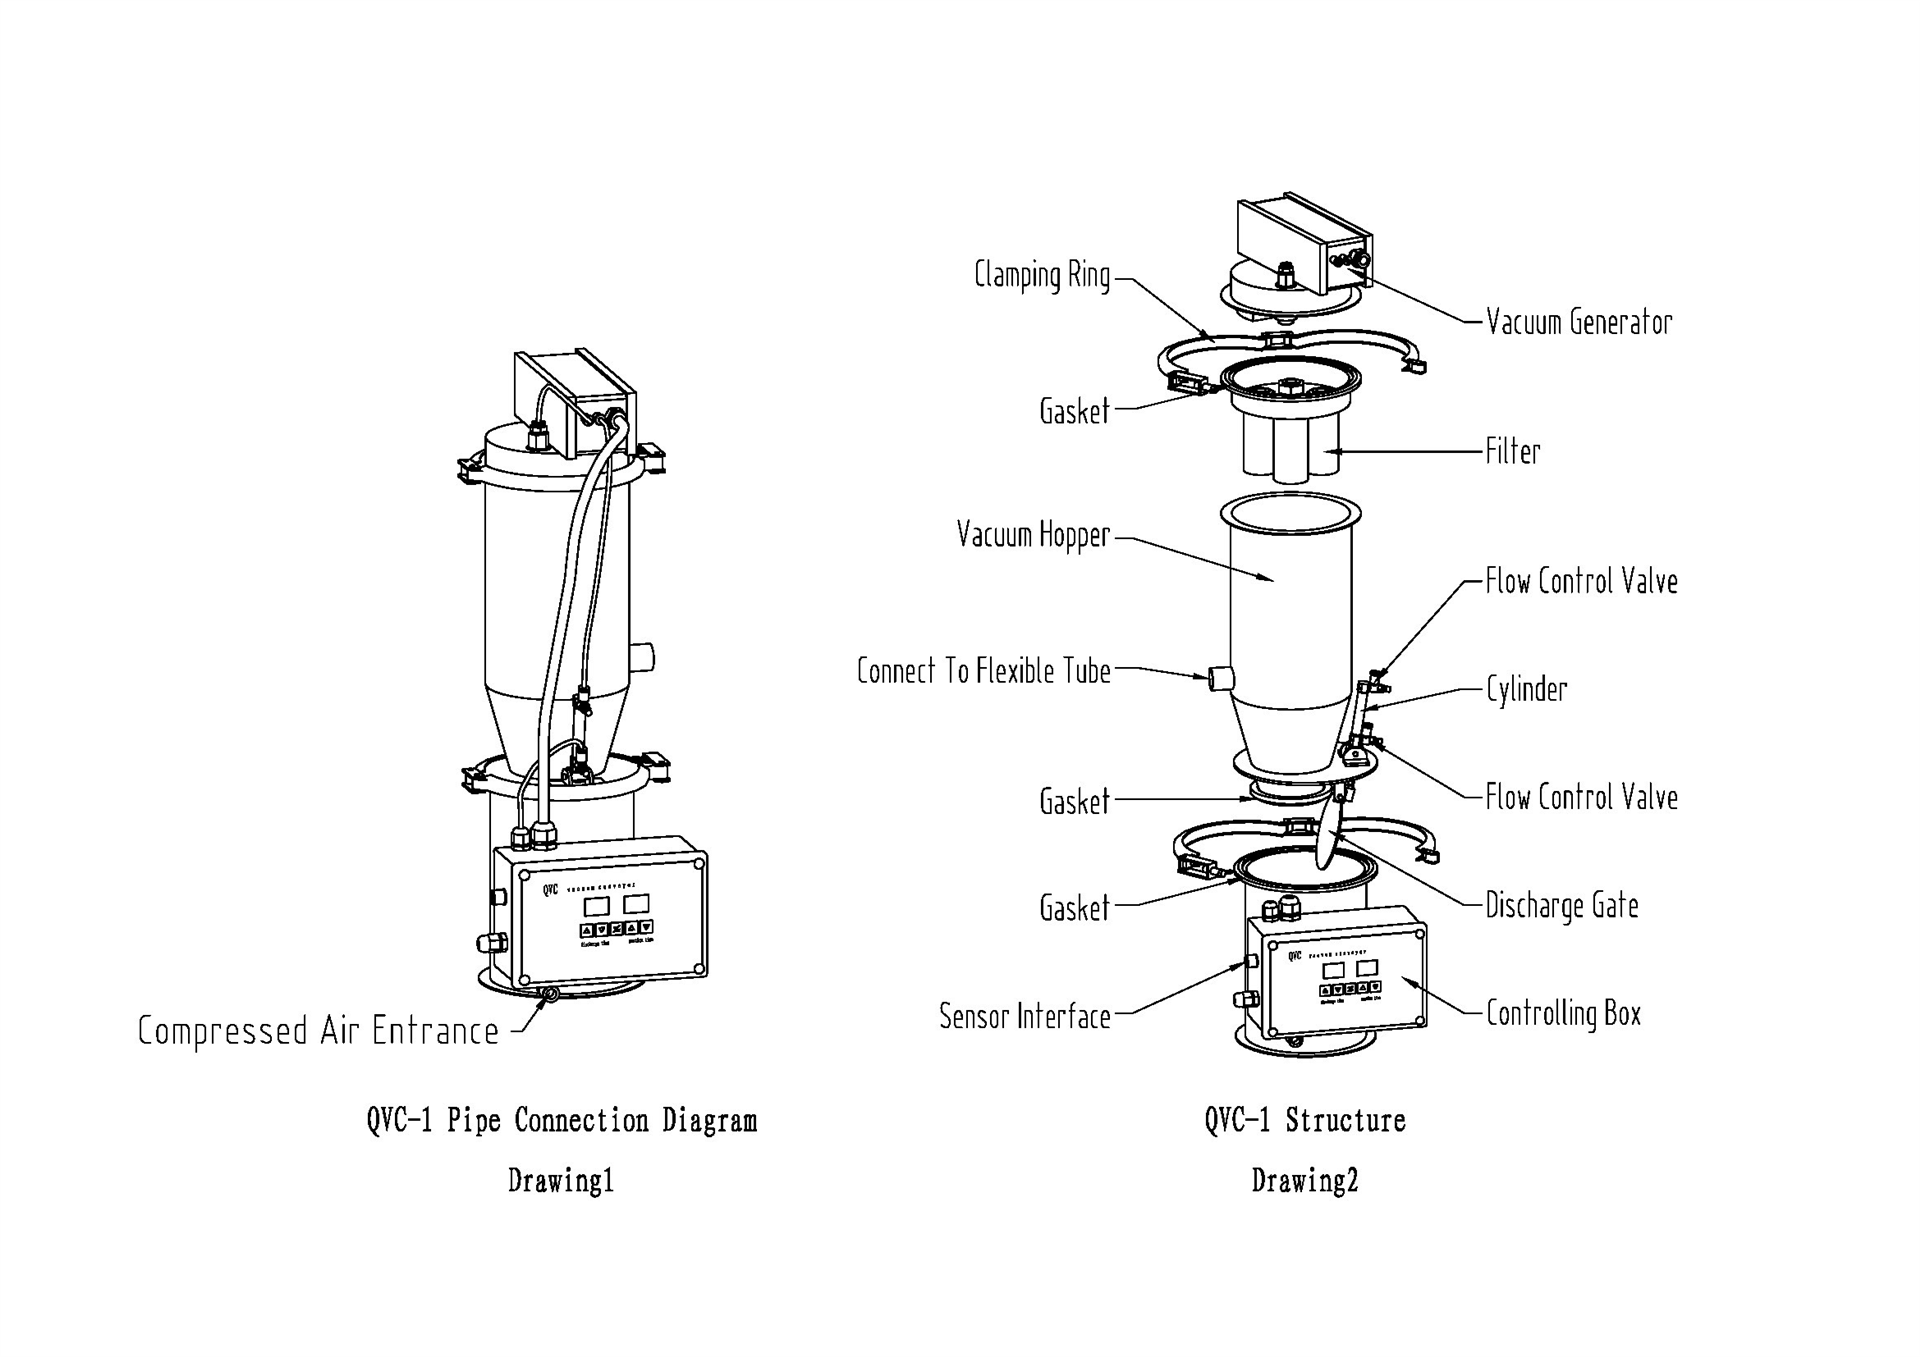 QVC-1 vacuum loader